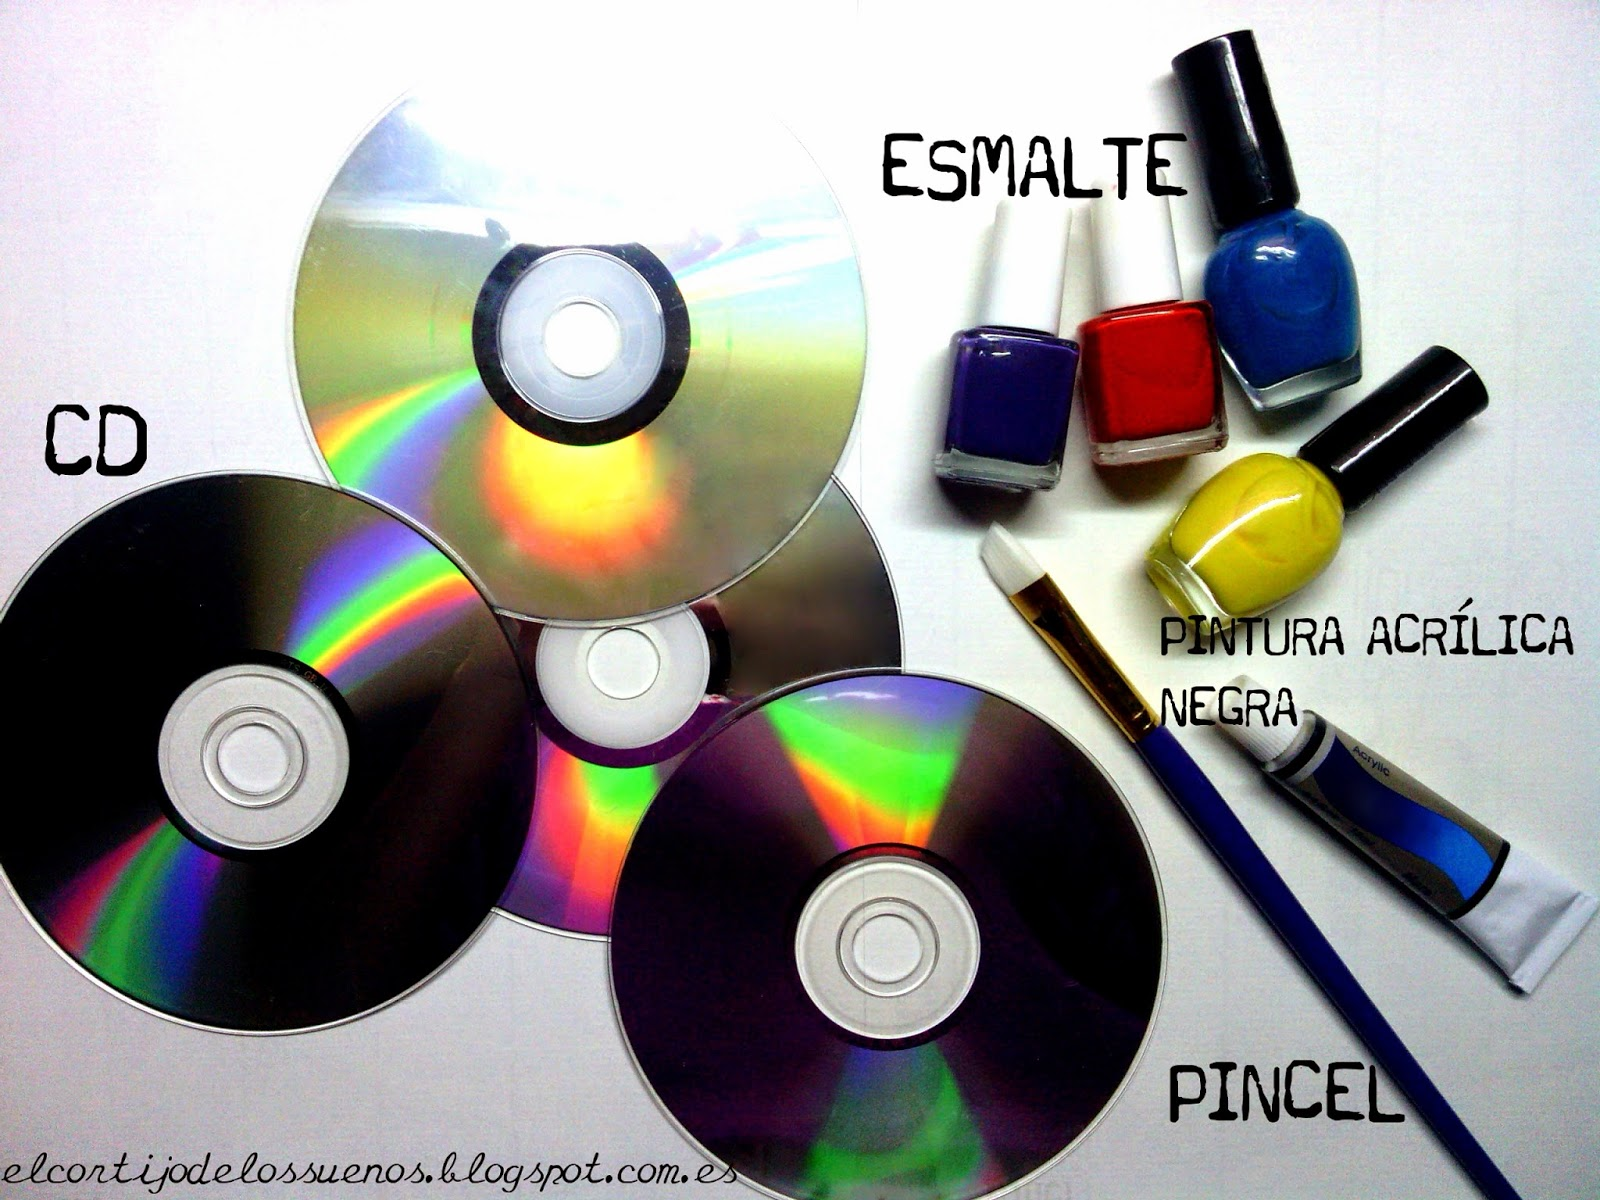 Discos De Vinilo Con Cds Manualidades